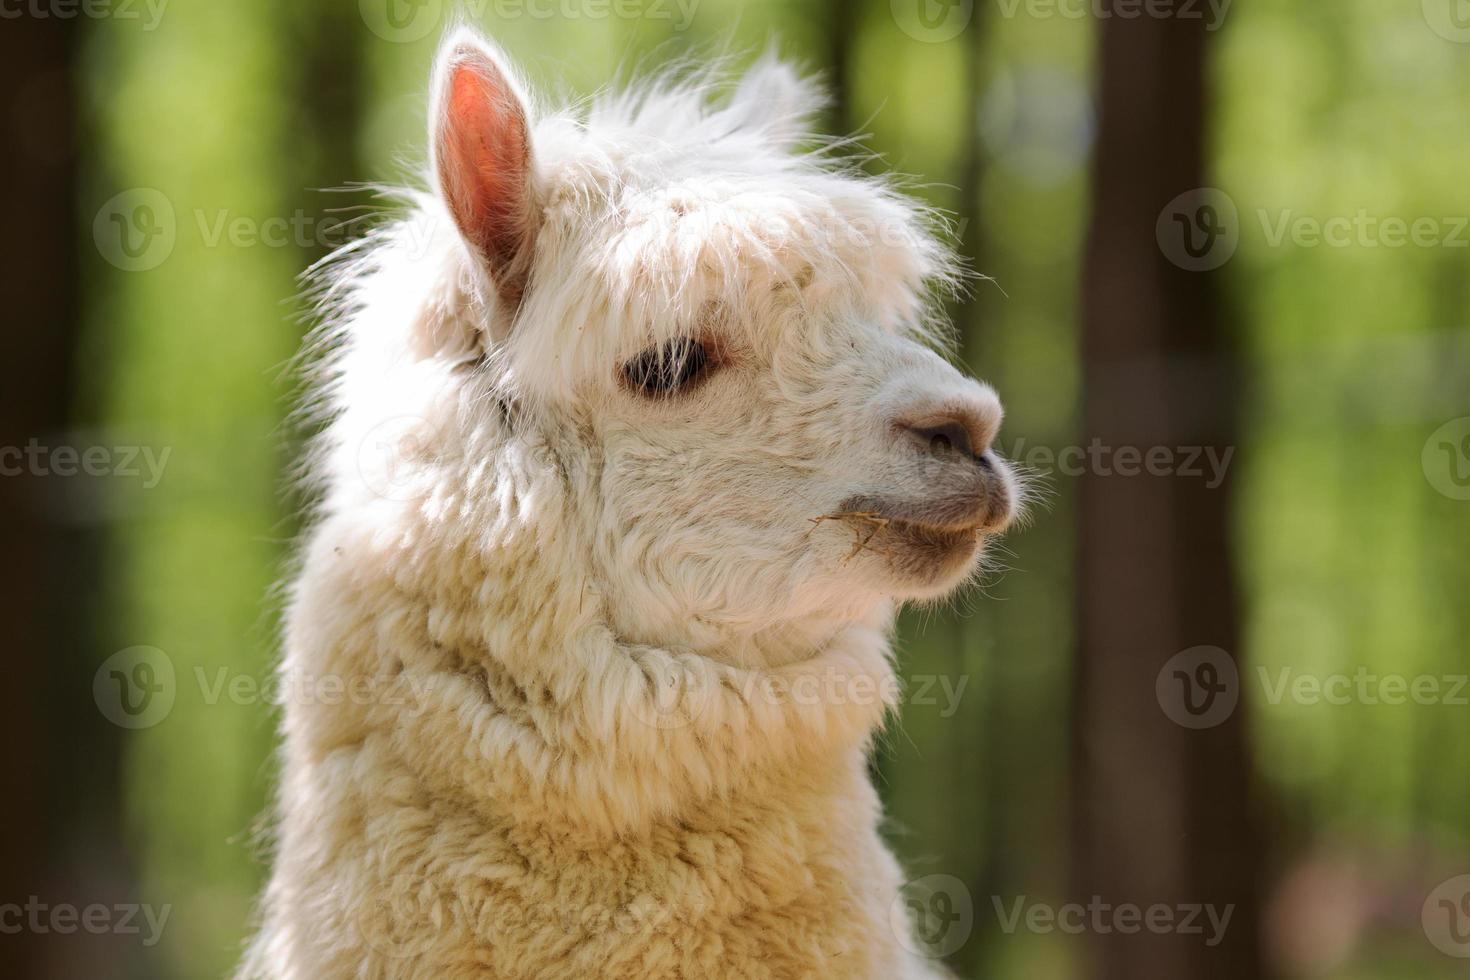 alpaca bianca foto